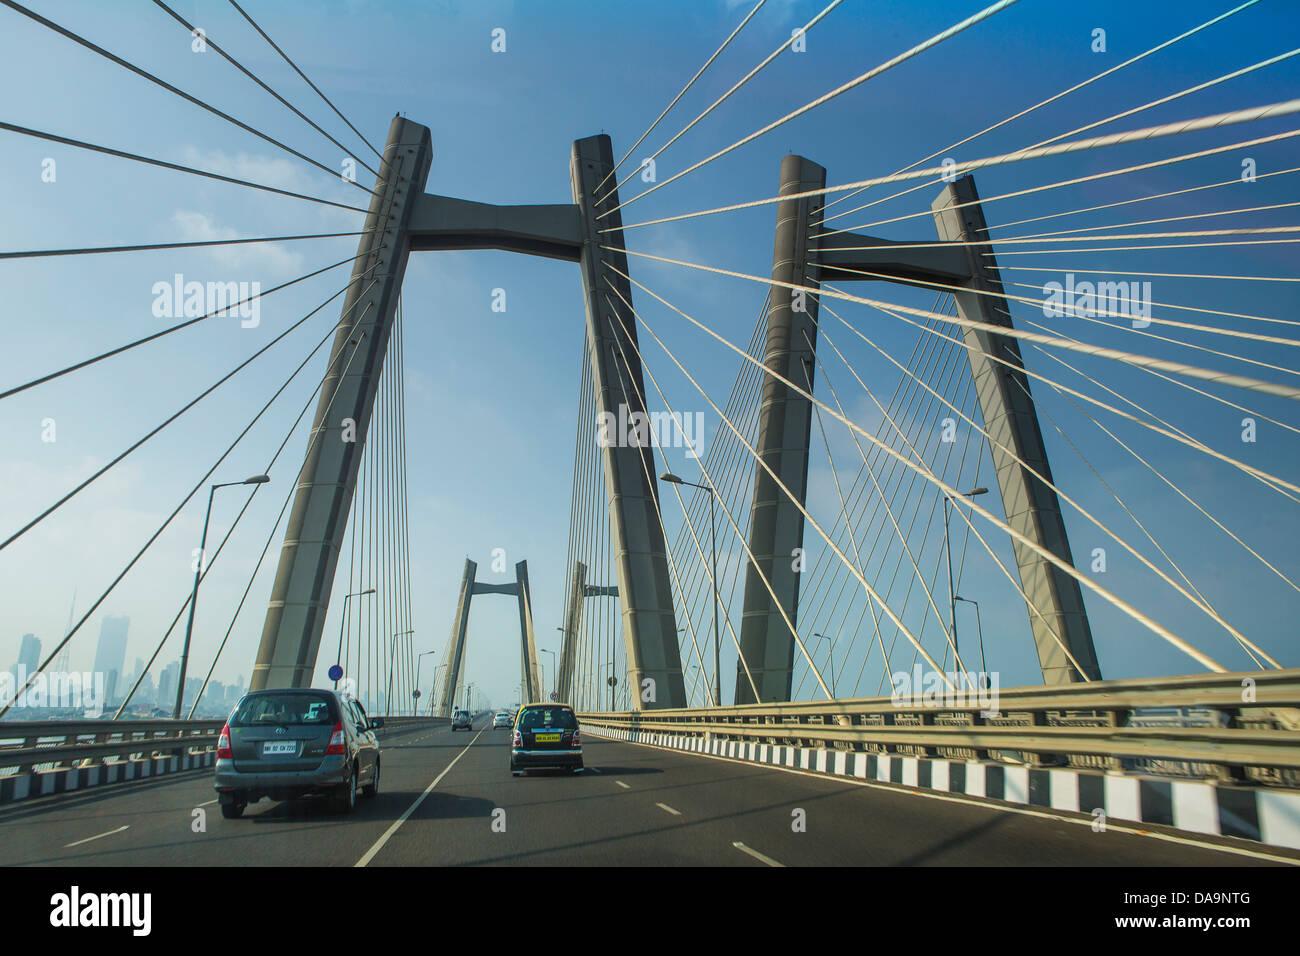 L'Inde, l'Inde, Asie, Maharashtra, Mumbai, Bombay, la ville, de la mer, Bandra Worli Lien, architecture, Photo Stock